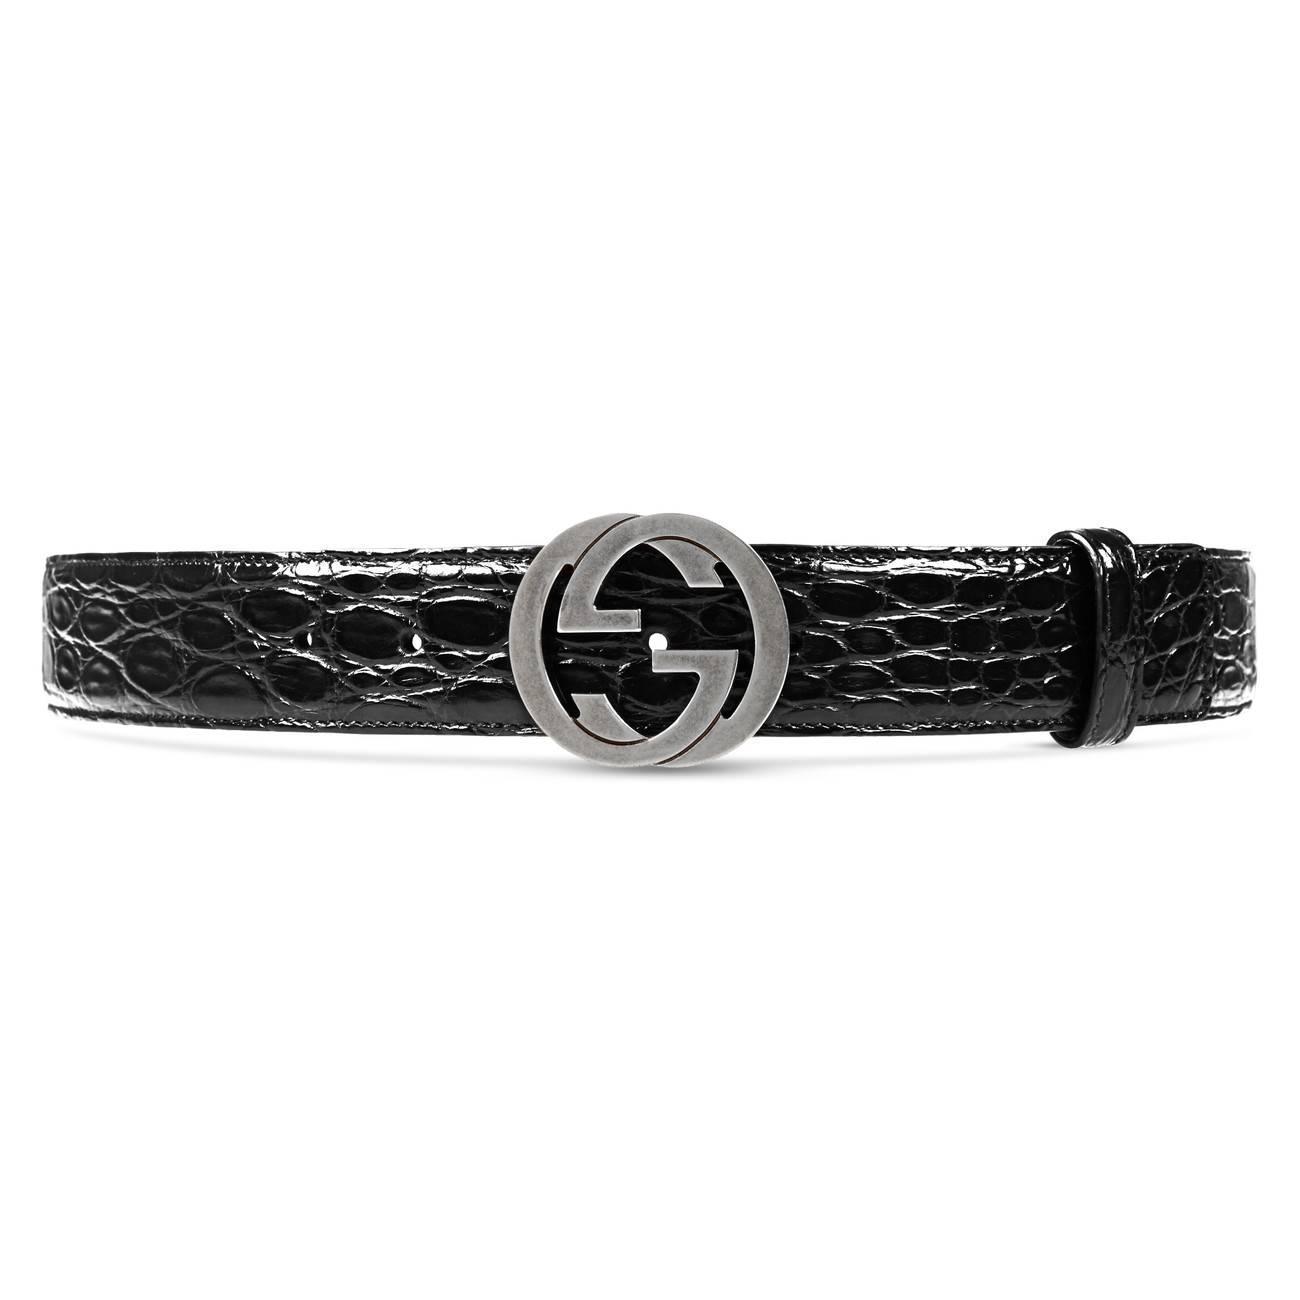 5a4c3945c72 Gucci Crocodile Belt With Interlocking G in Black for Men - Save 10 ...